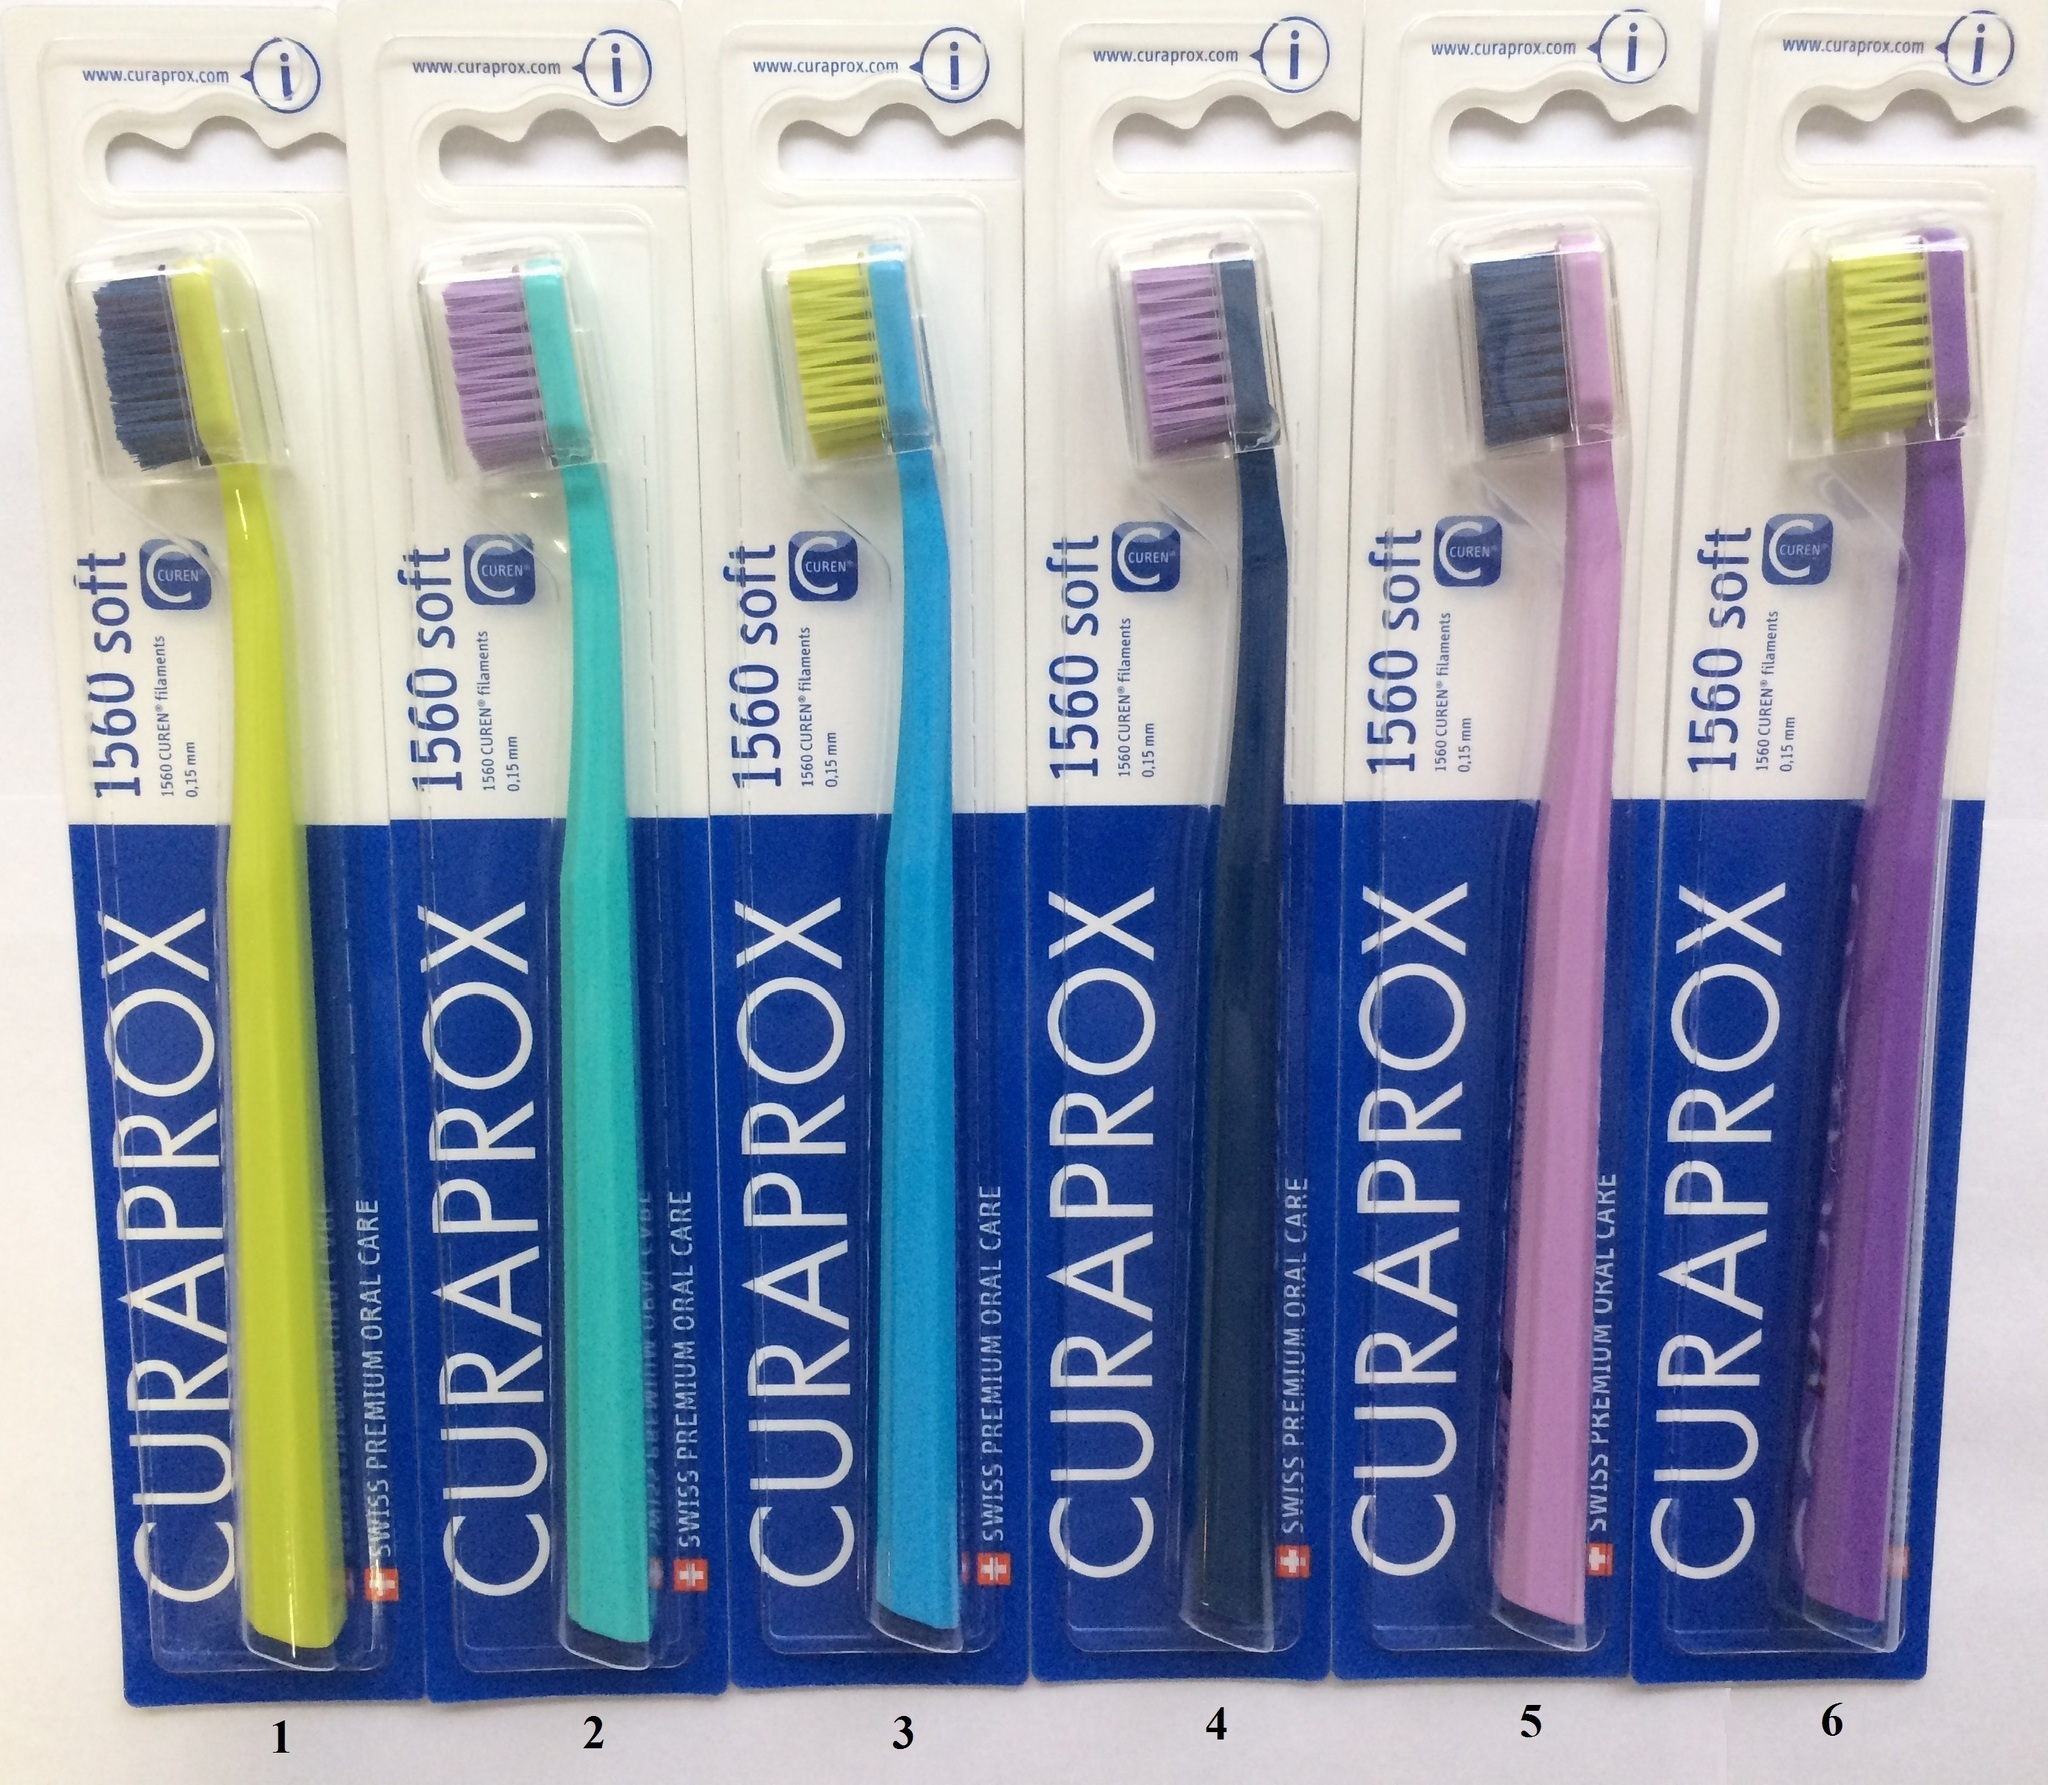 Зубная щетка мягкая / CURAPROX CS 1560